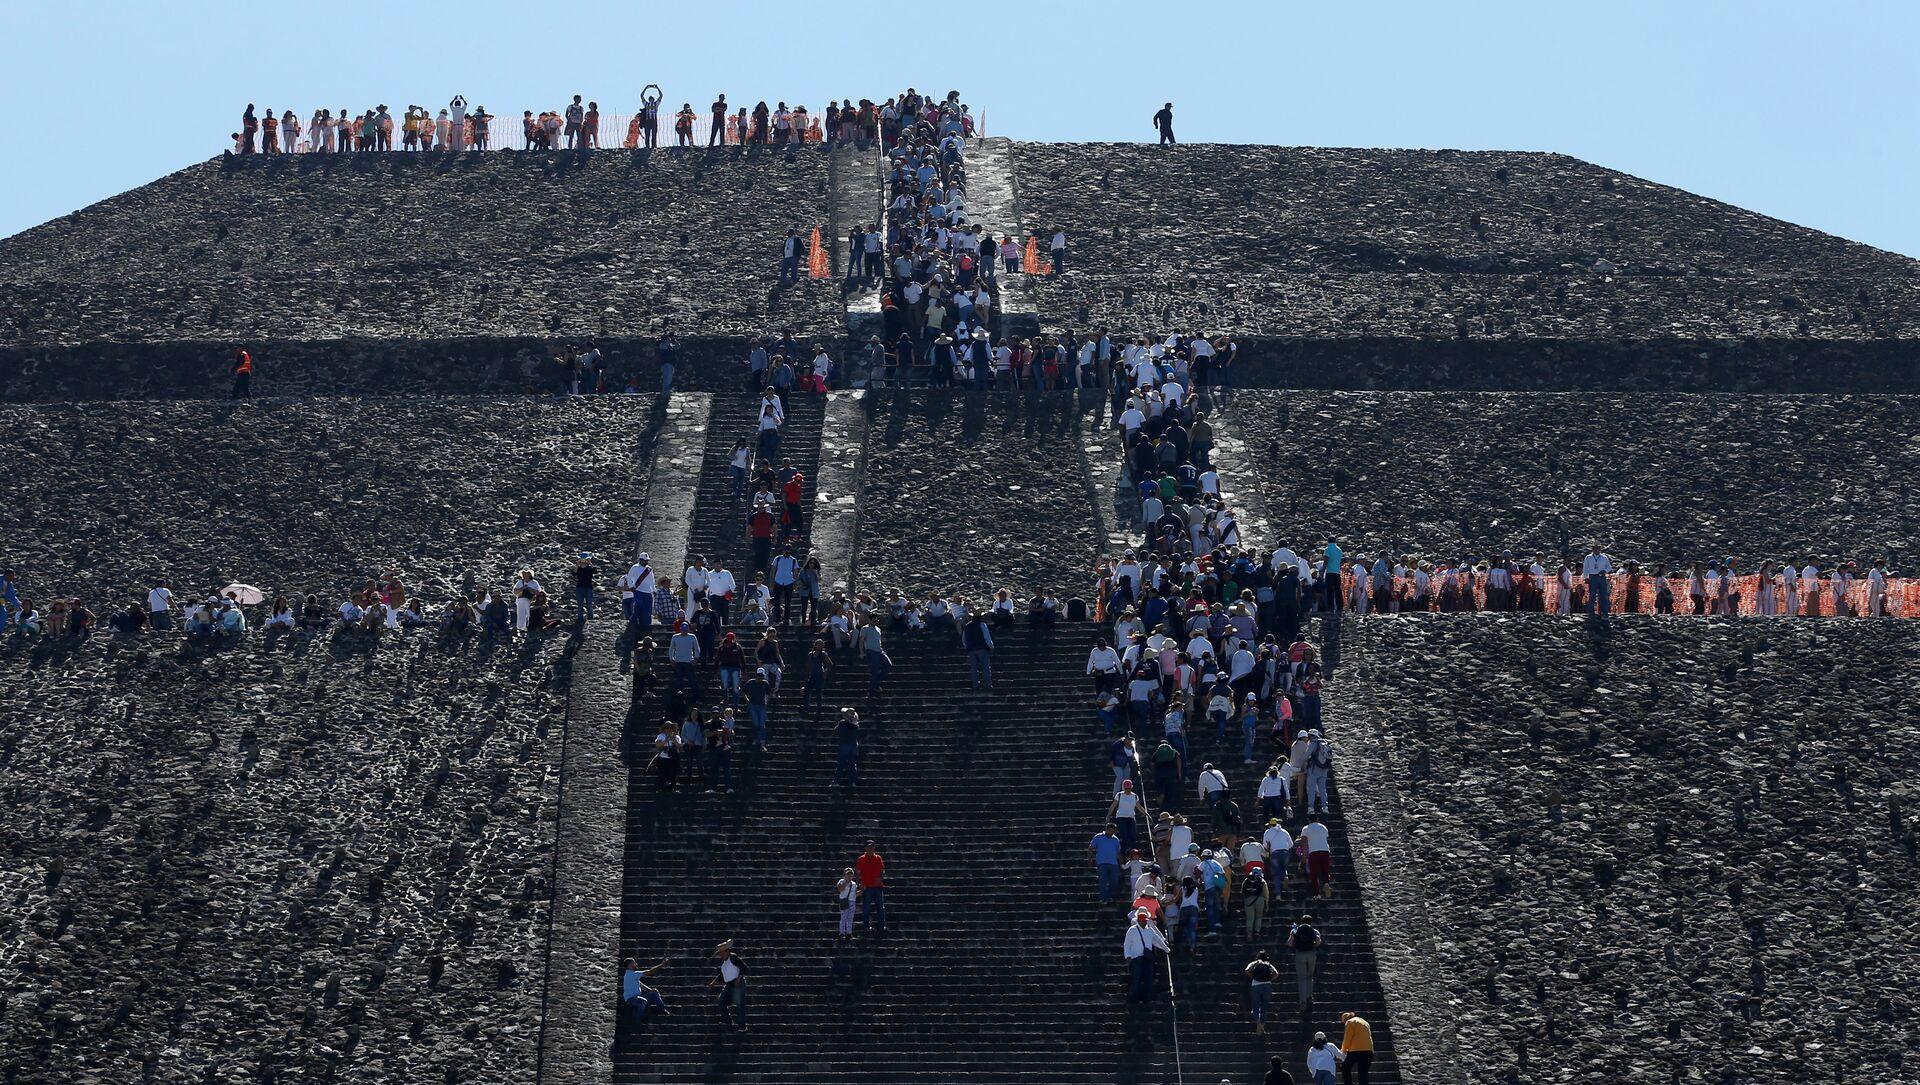 Pirámide de Teotihuacan, México - Sputnik Mundo, 1920, 10.02.2021